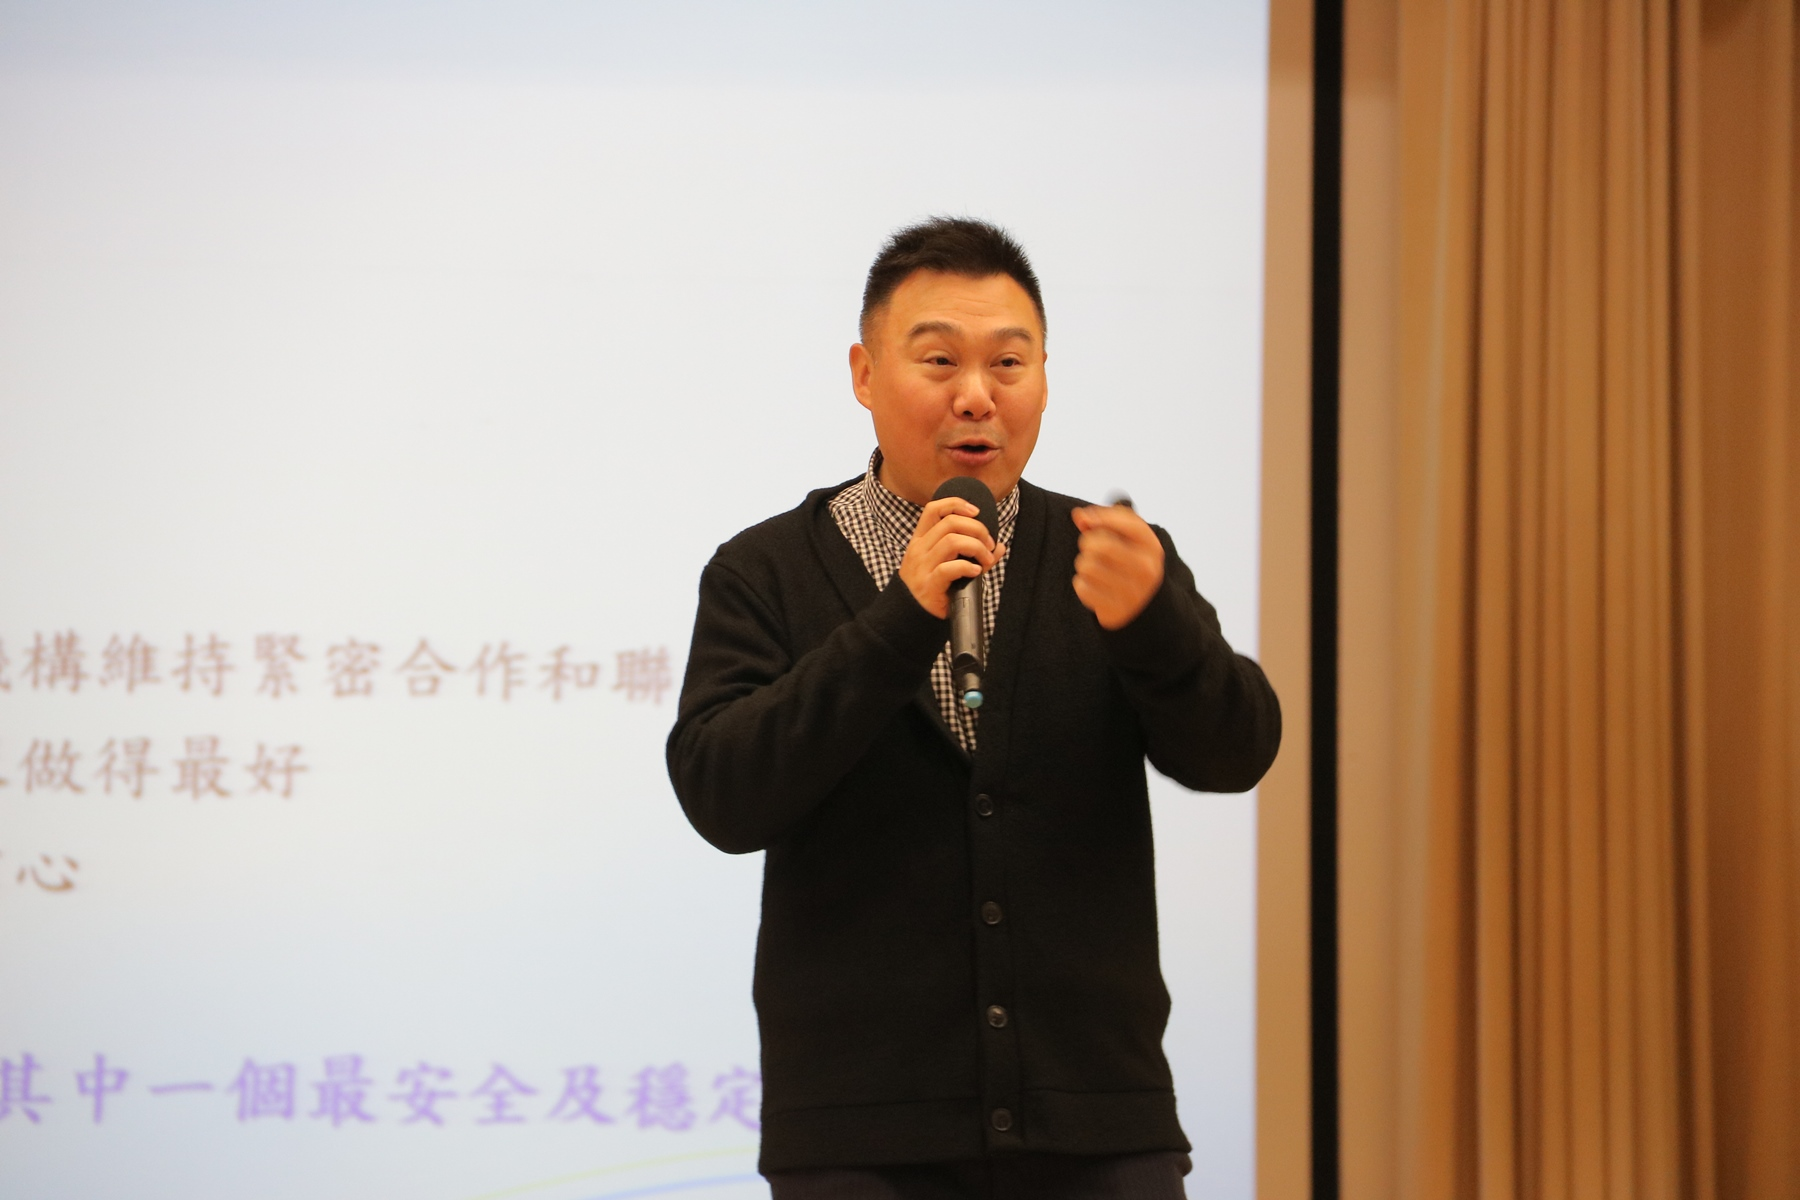 http://npc.edu.hk/sites/default/files/img_2109.jpg